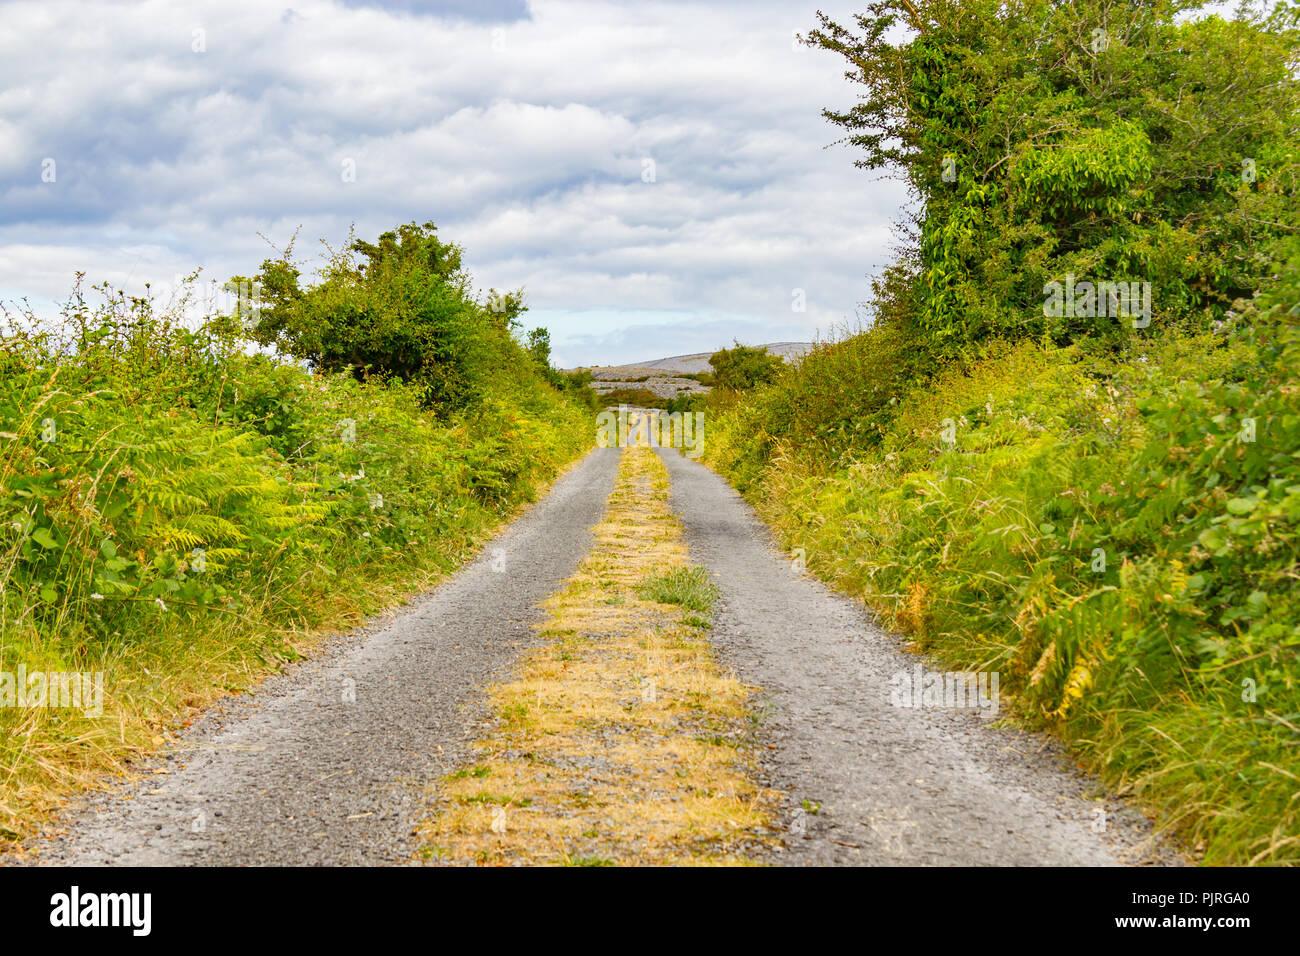 Farm road around vegetation in Ballyvaughan, Ireland - Stock Image